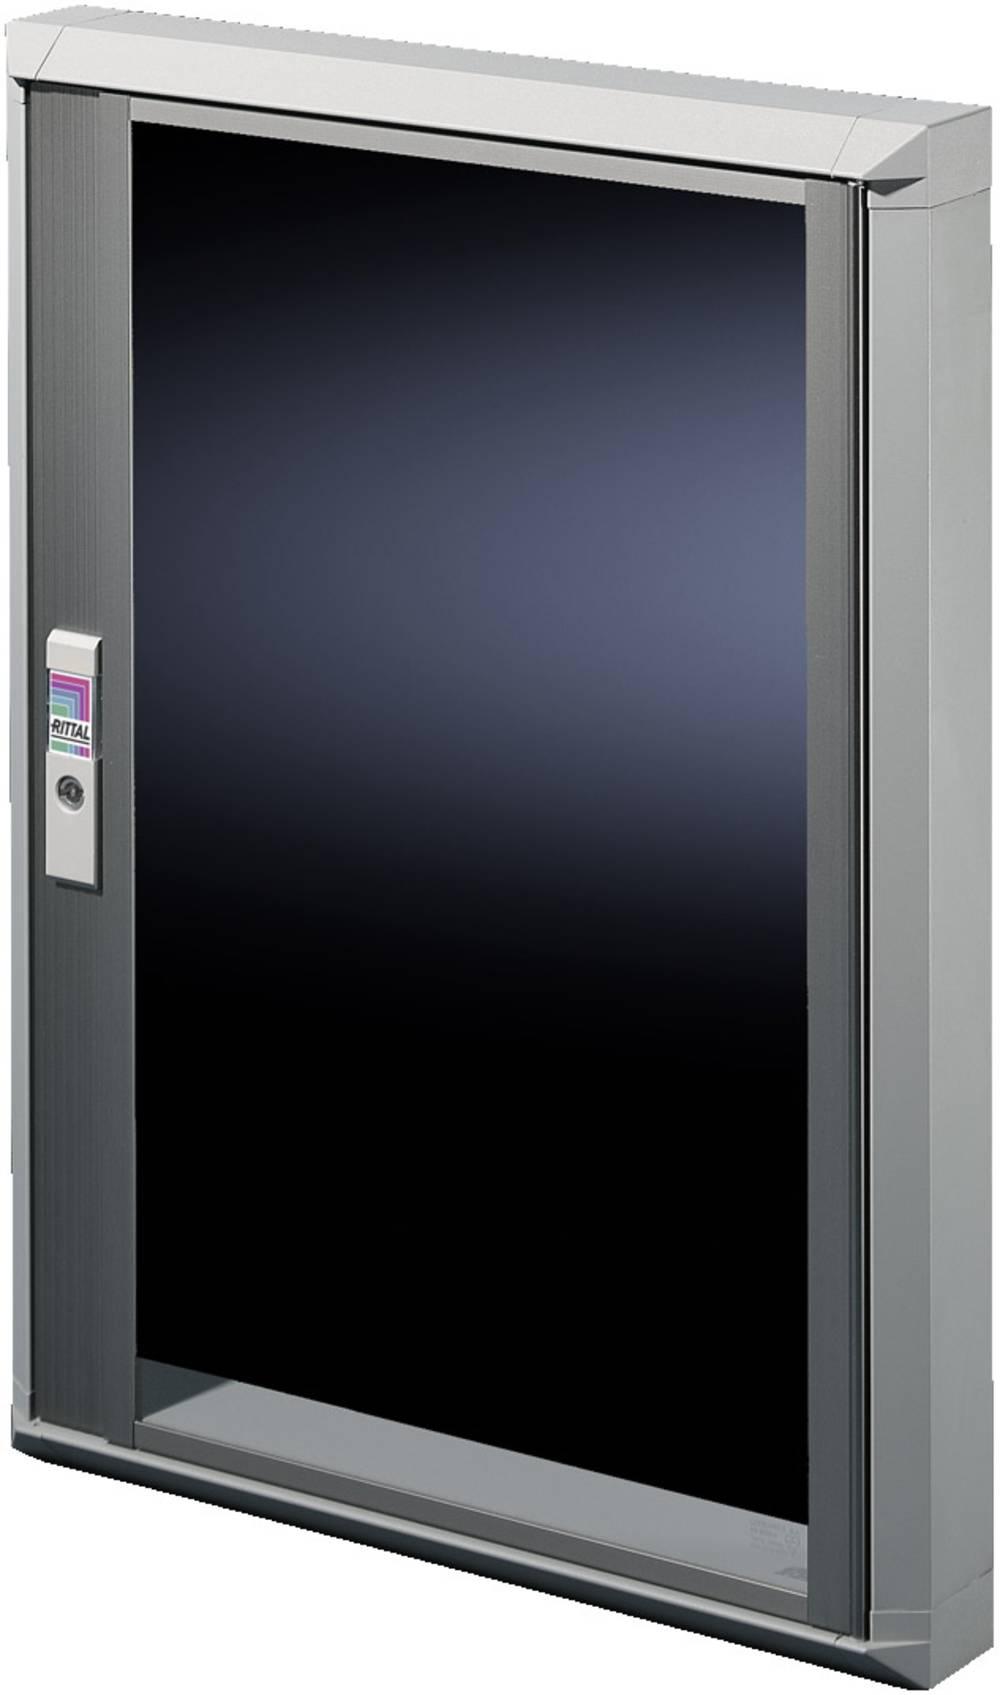 Vindue Rittal FT 2735.250 (B x H) 700 mm x 670 mm Glas Lysegrå (RAL 7035), Transparent 1 stk